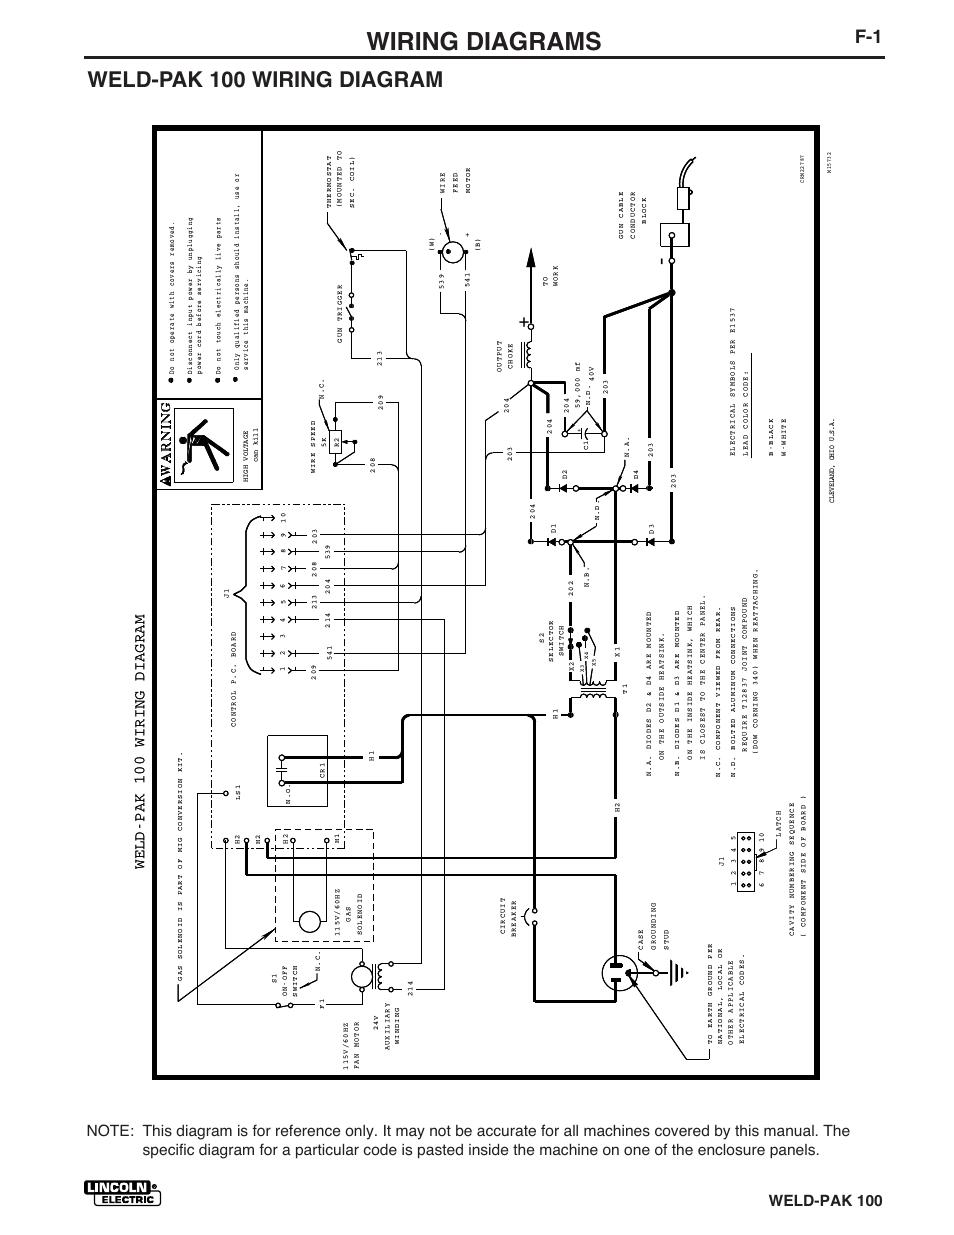 medium resolution of lincoln electric welder wiring diagram free picture wiring diagram rh 17 3 12 jacobwinterstein com lincoln sa 250 welder wiring diagram forney arc welder